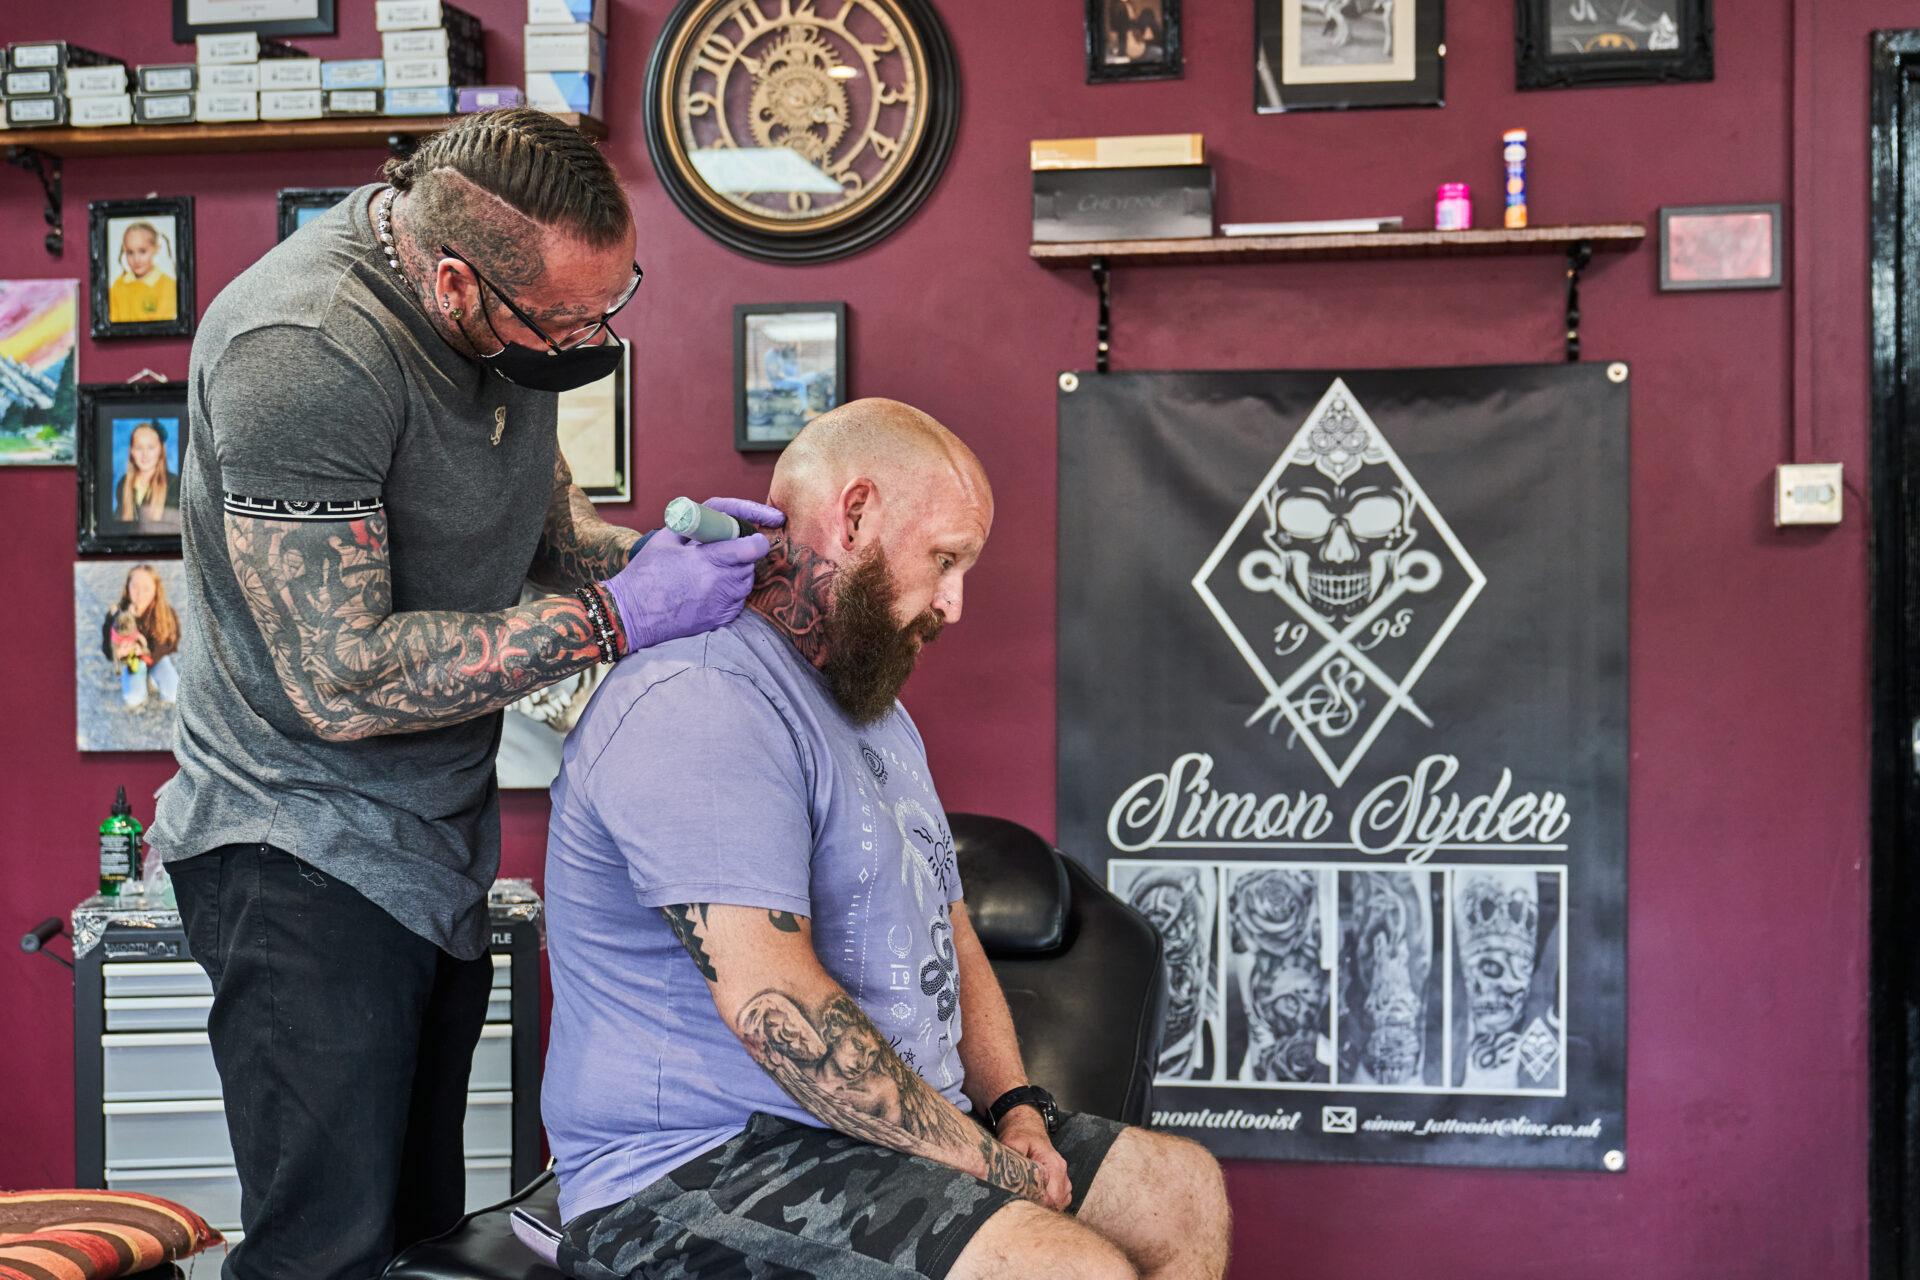 Simon Syder. Norwich Tattooist